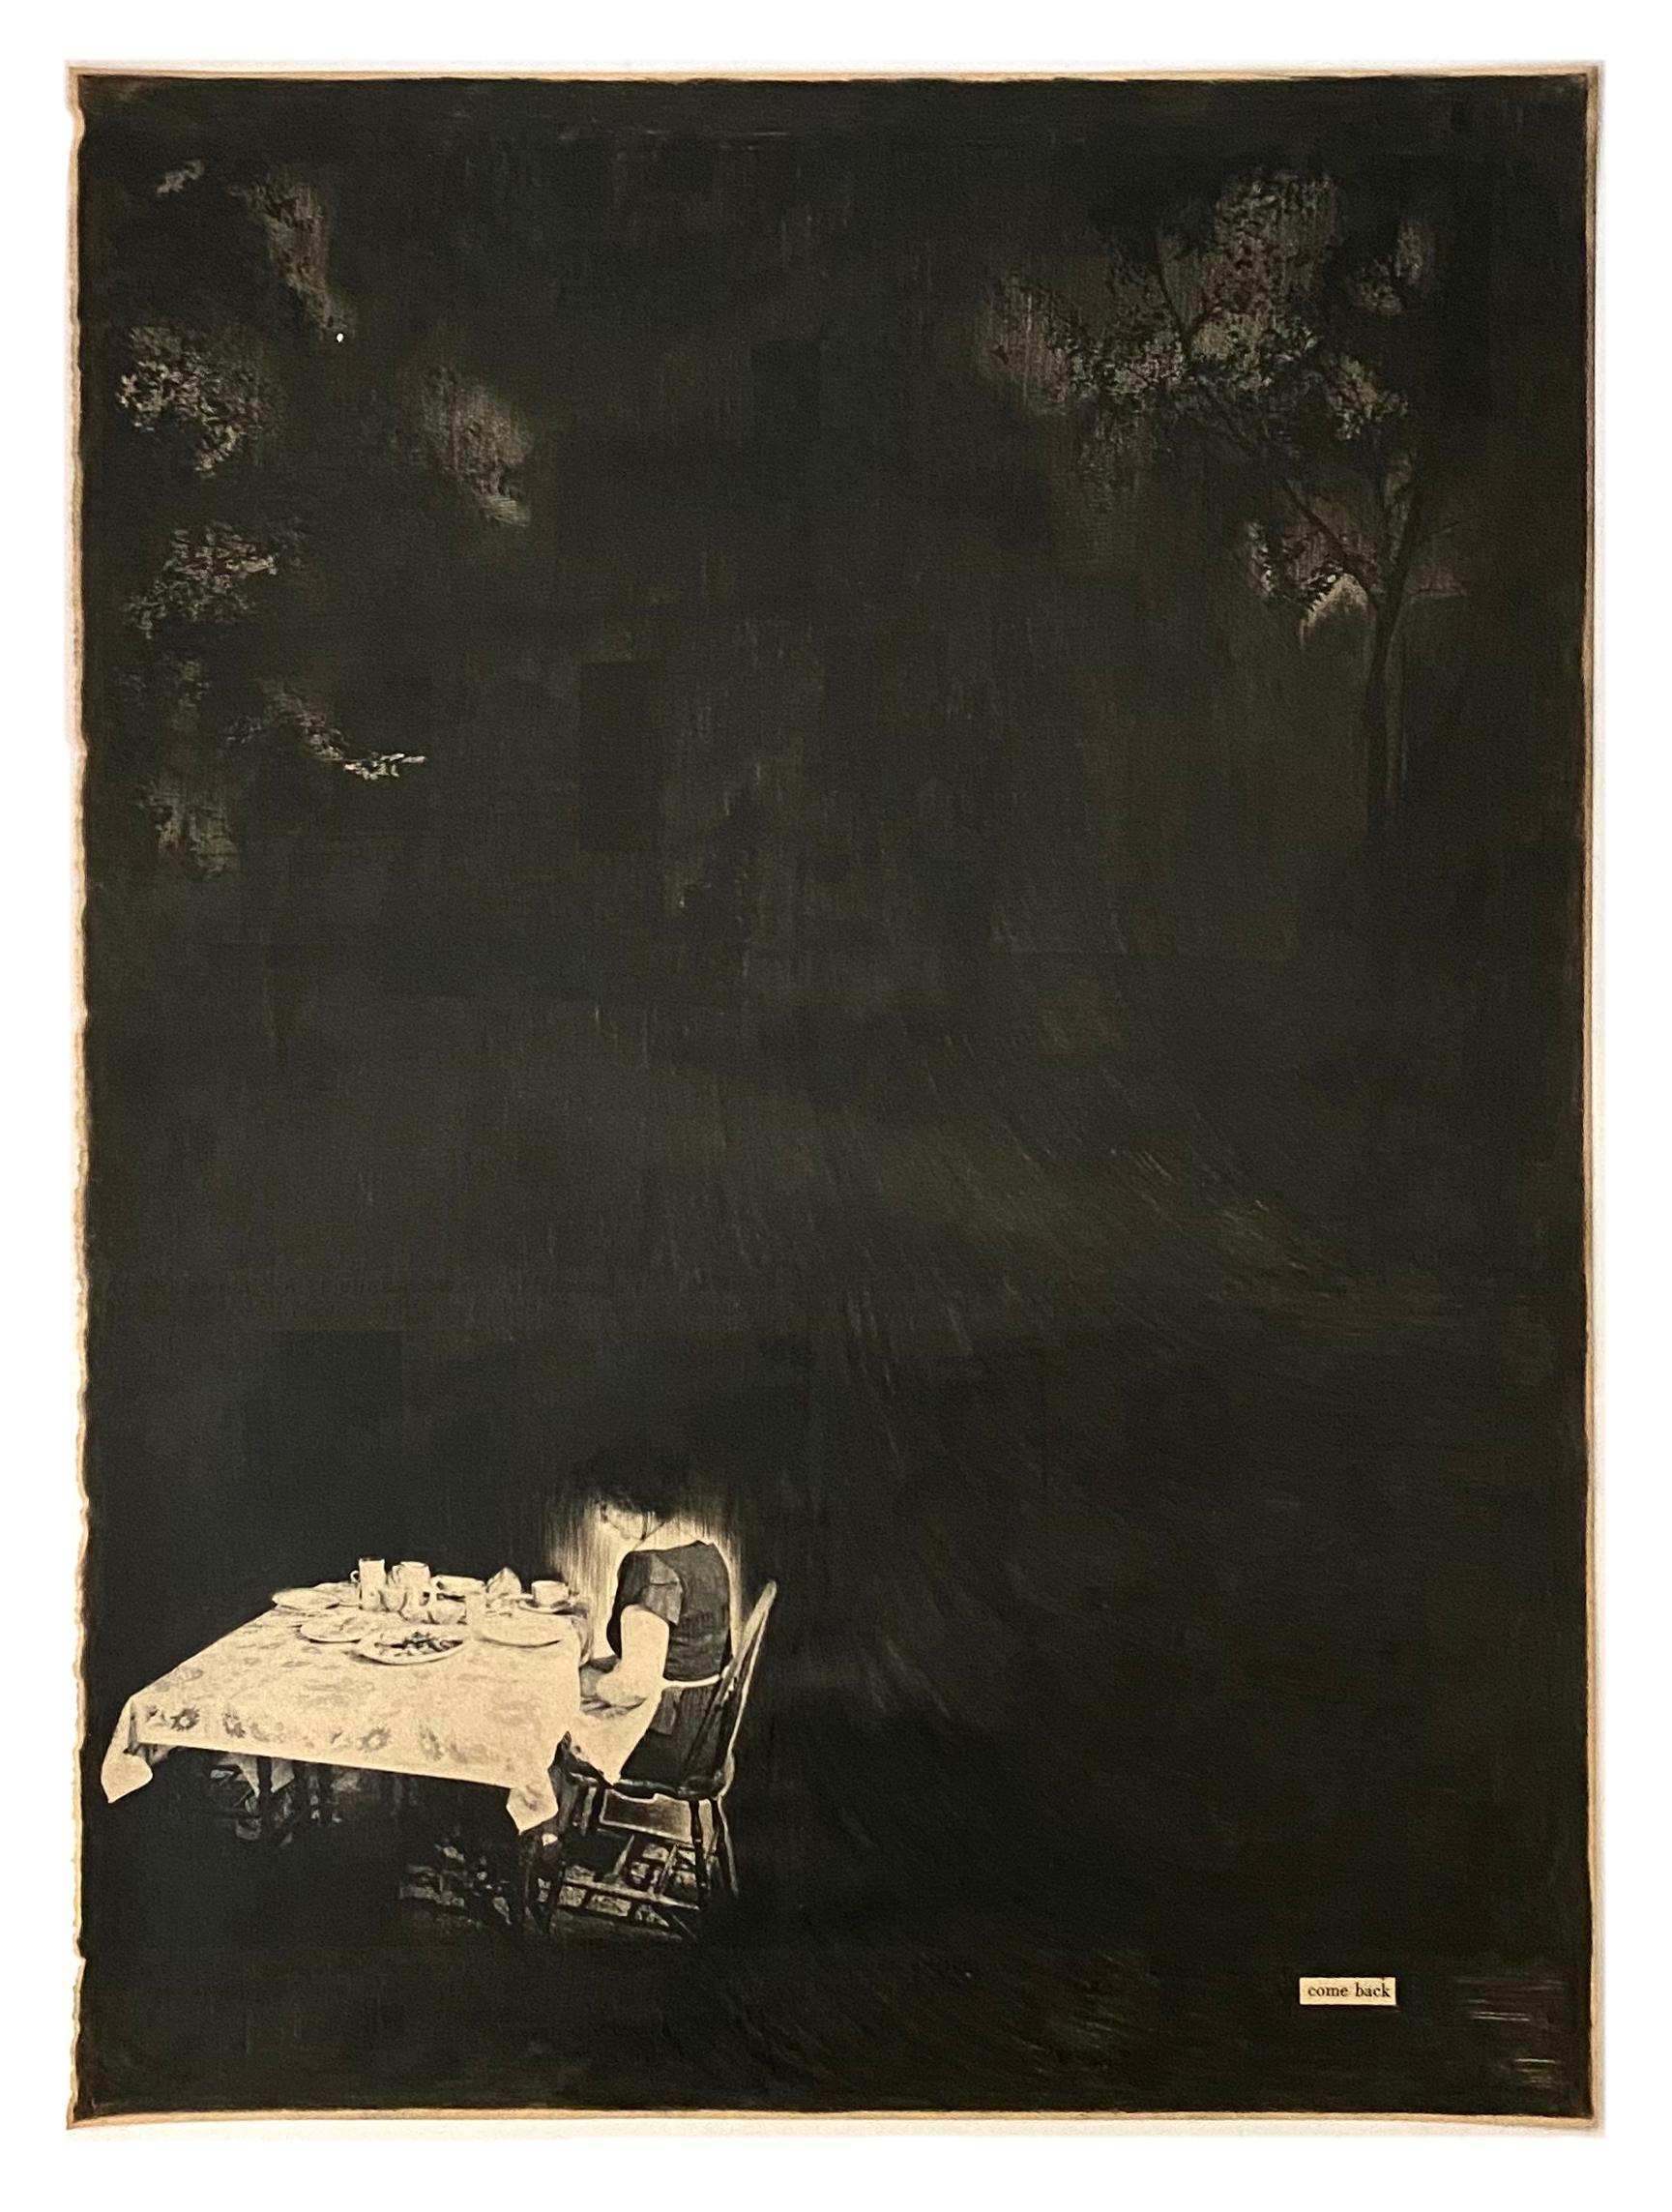 Black Pages Come Back- 2021  Aquarelpotlood op magazine 26 x 35 cm   framed 950 € Interesse? Contacteer ons